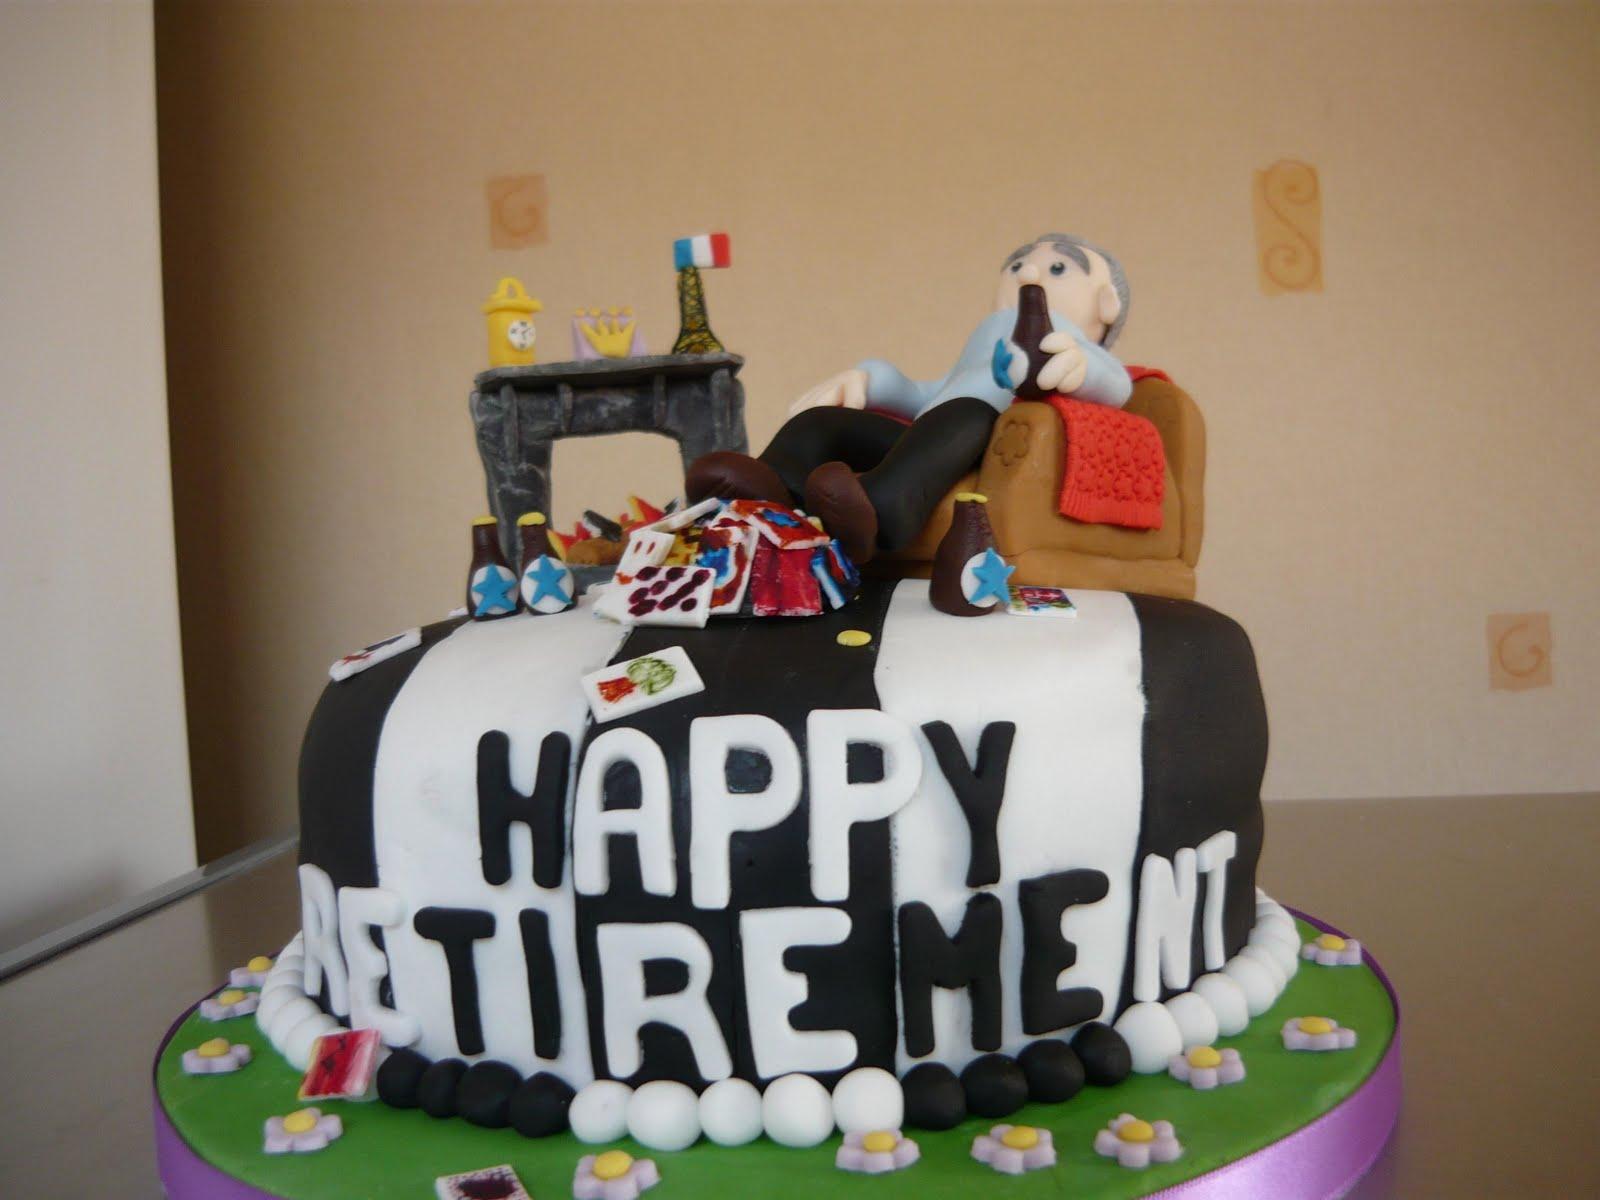 Cake Art - my new life.: 5th July 2011 - Hallmark Cards ...